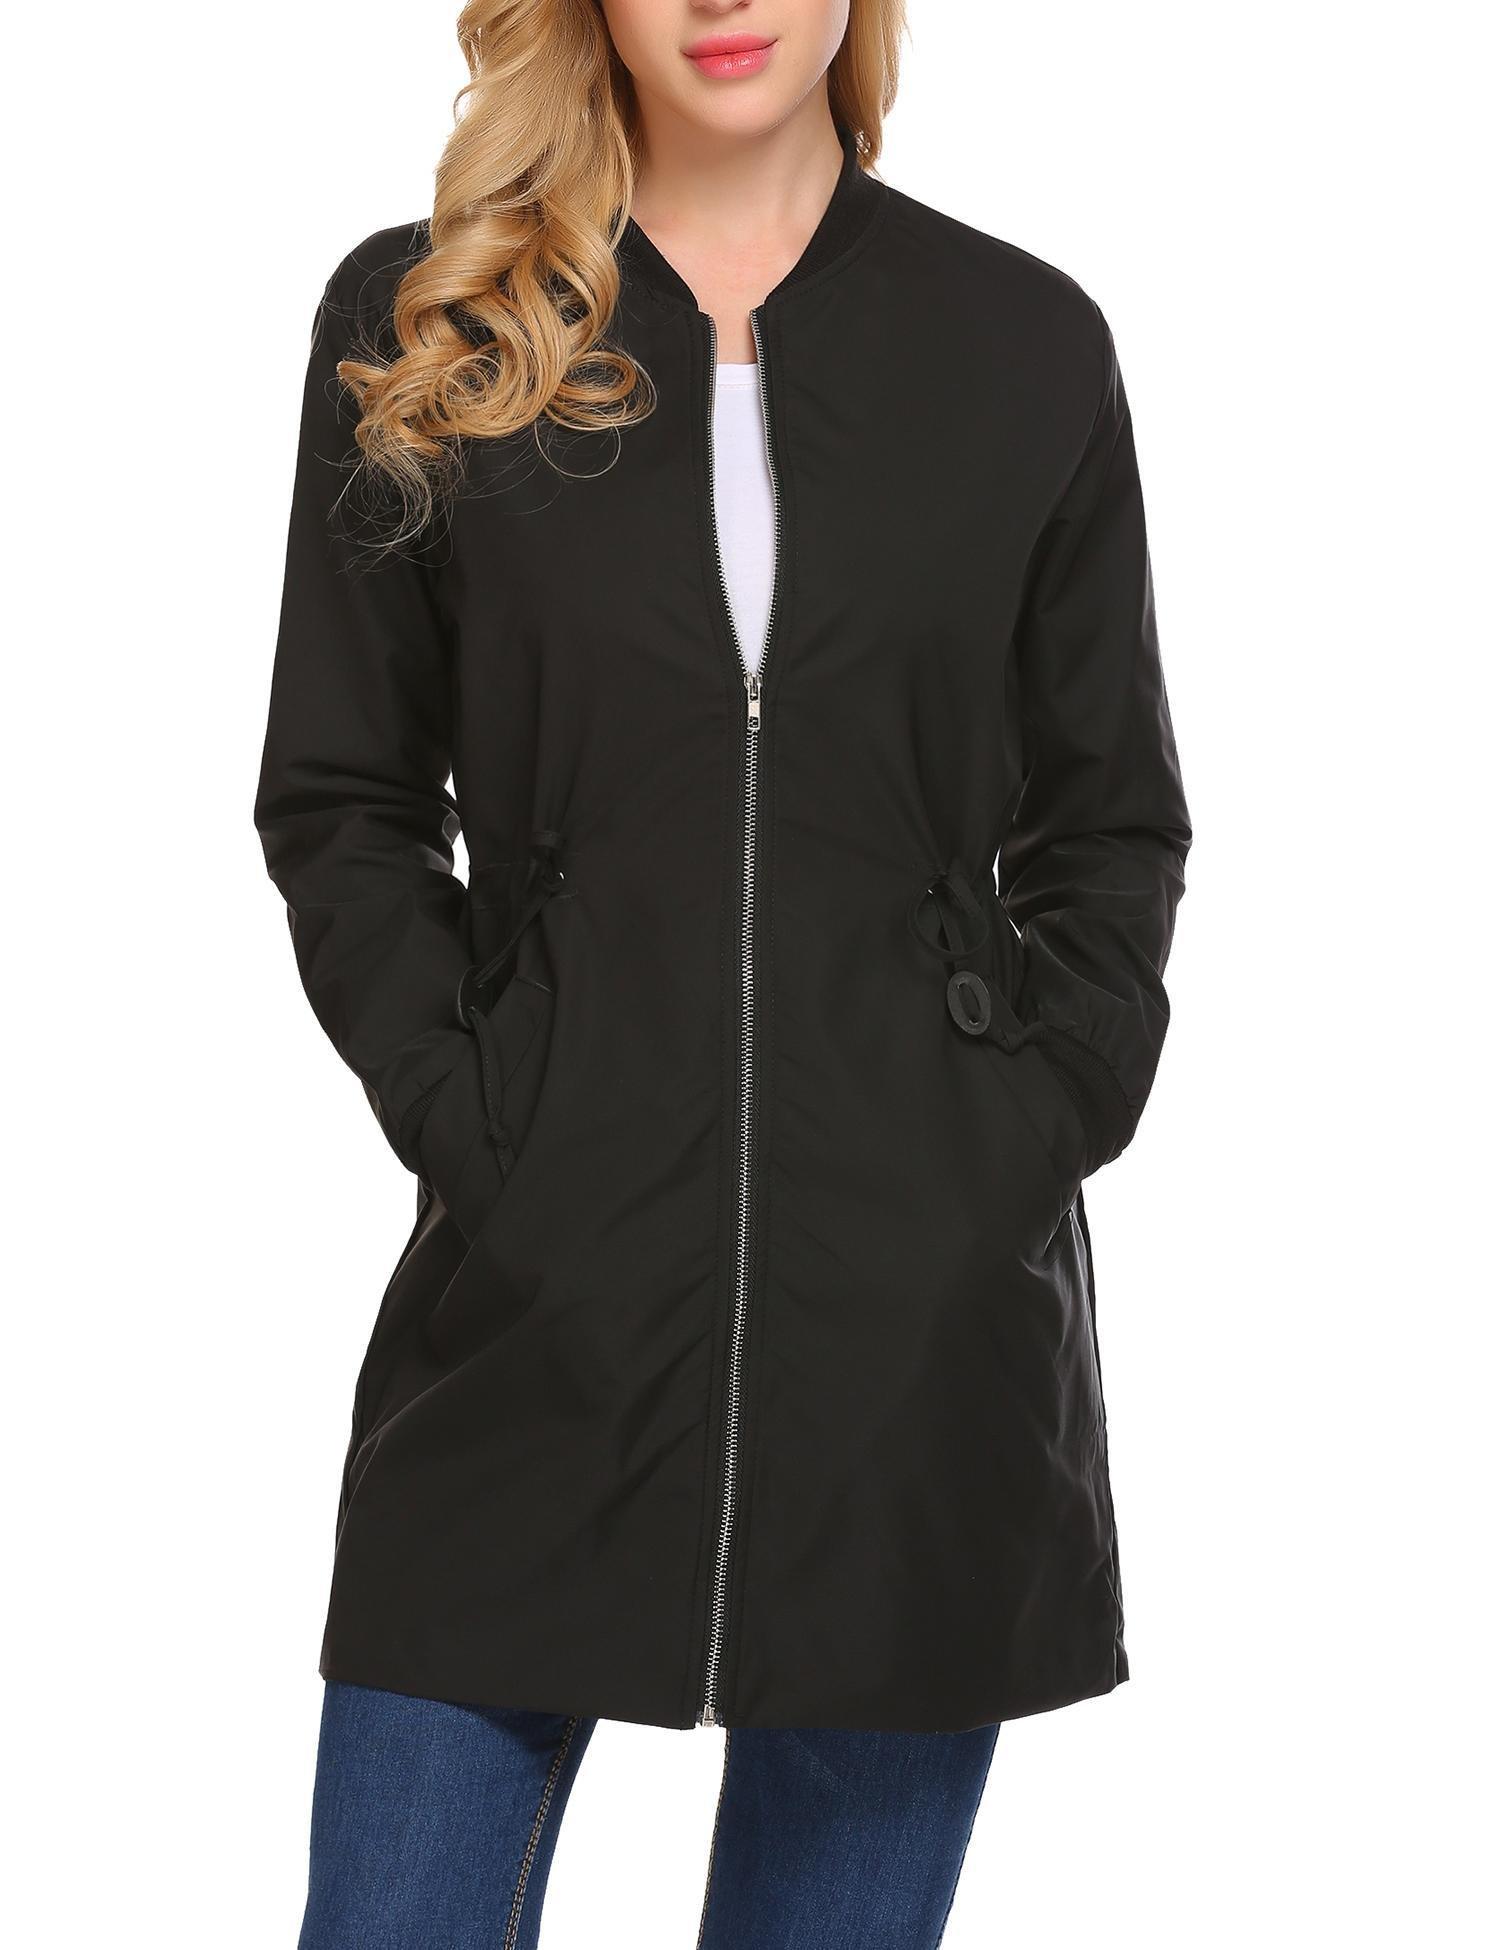 ELESOL Ladies Zipper Lightweight Long Sleeve Loose Coat Windbreaker Jacket Black/XL